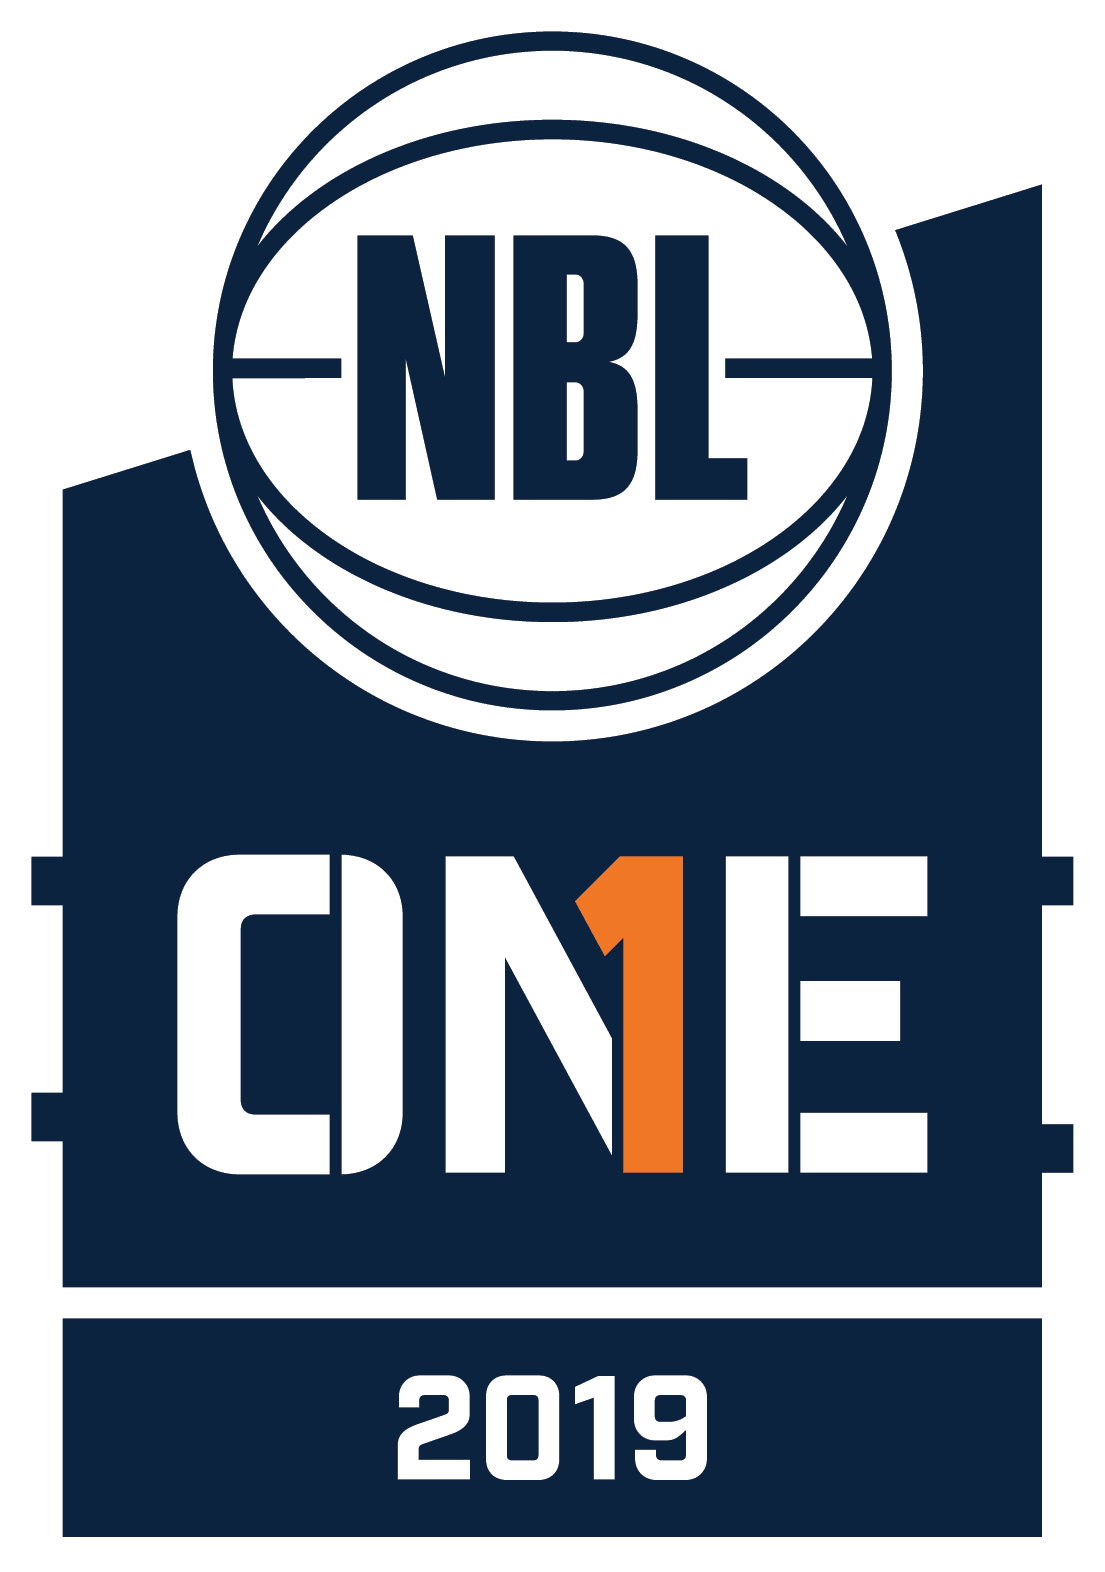 NBL1 Launches